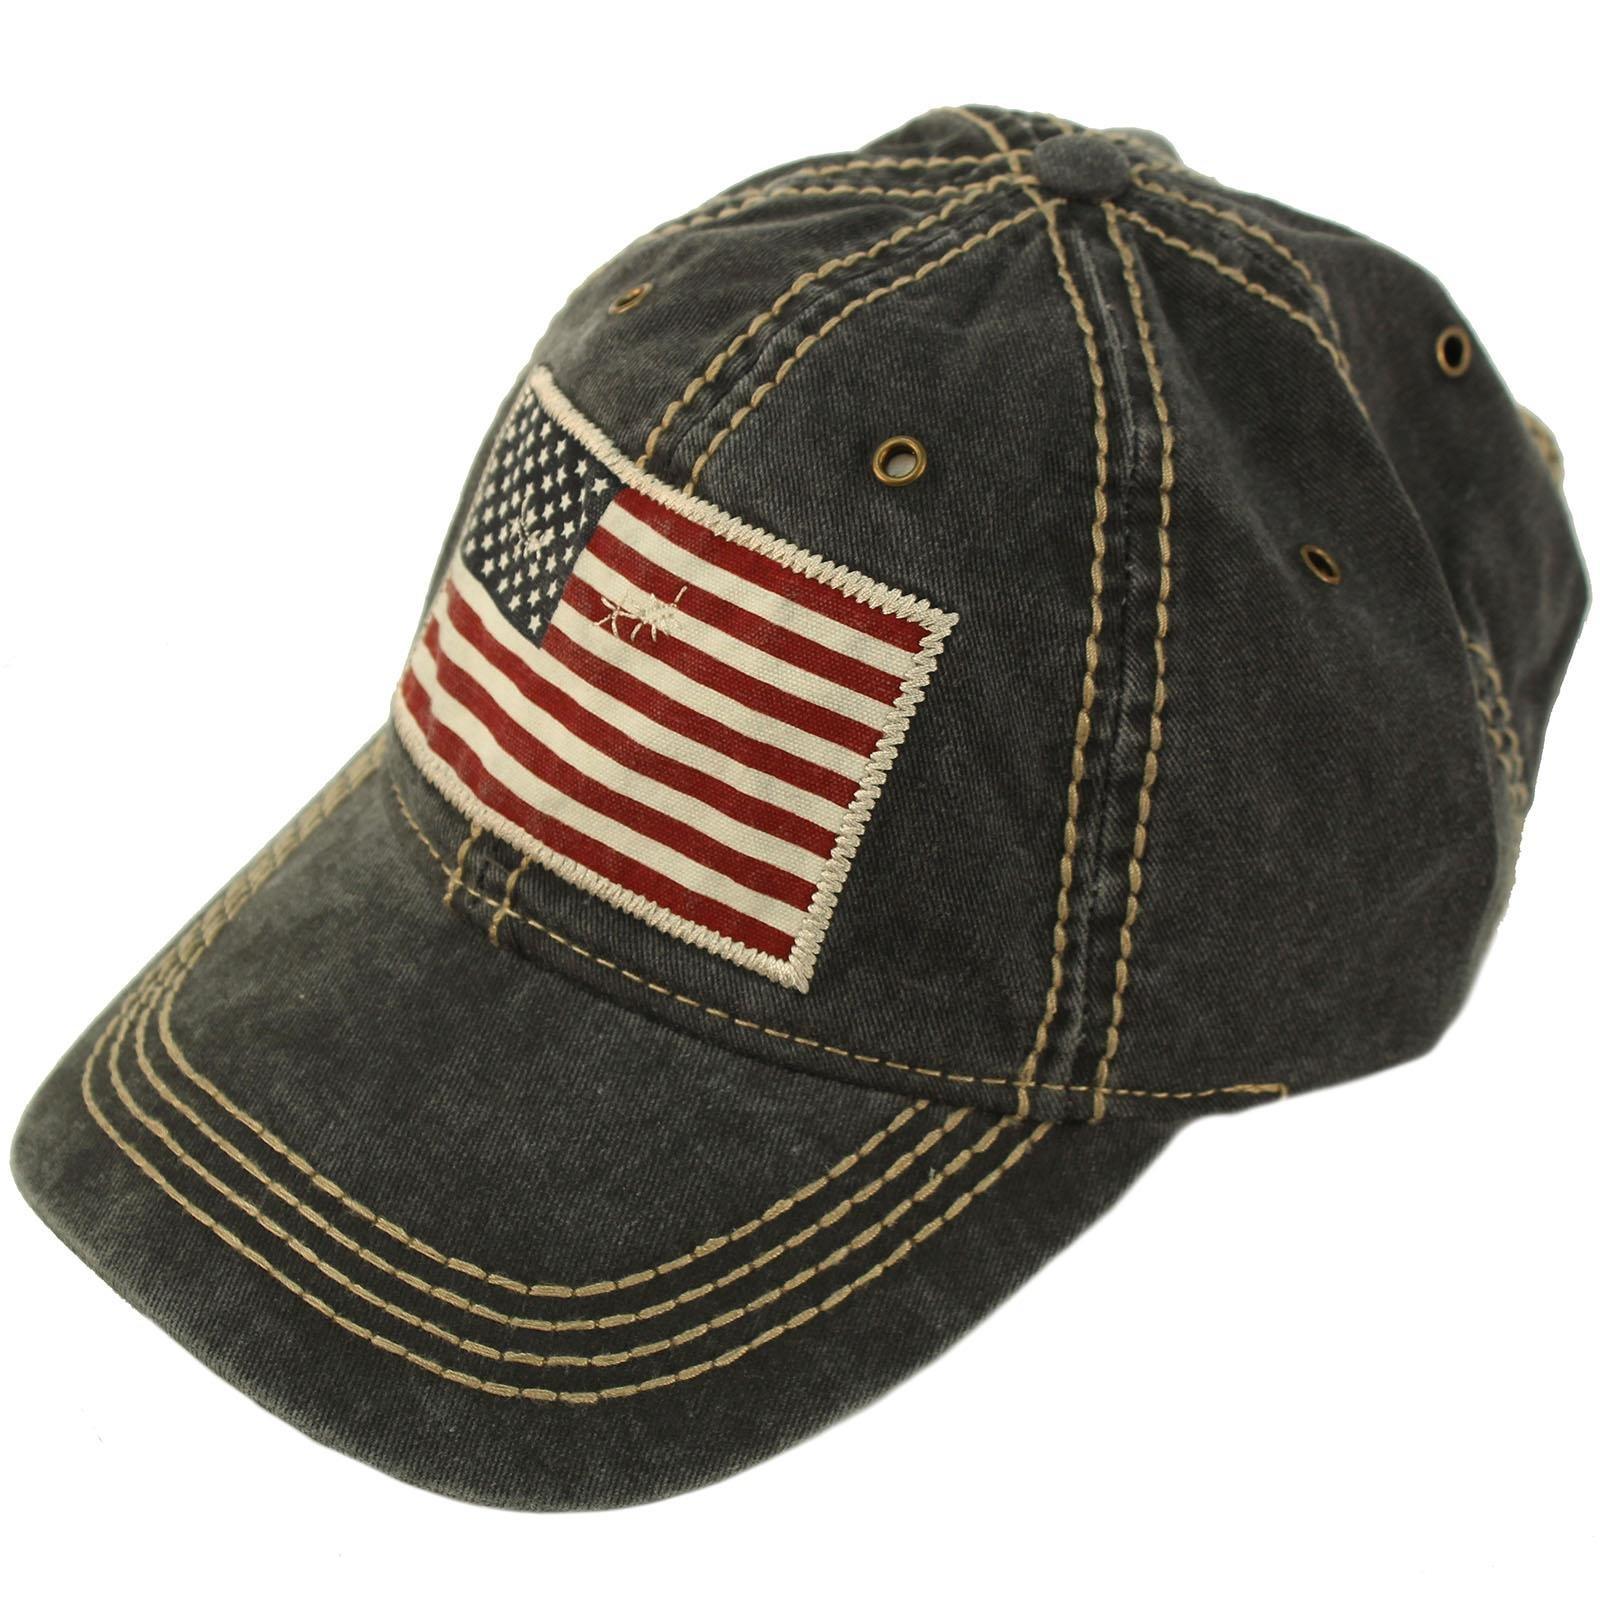 Epoch Unisex Washed Cotton Vintage USA Flag Low Profile Summer Baseball Cap Hat Black